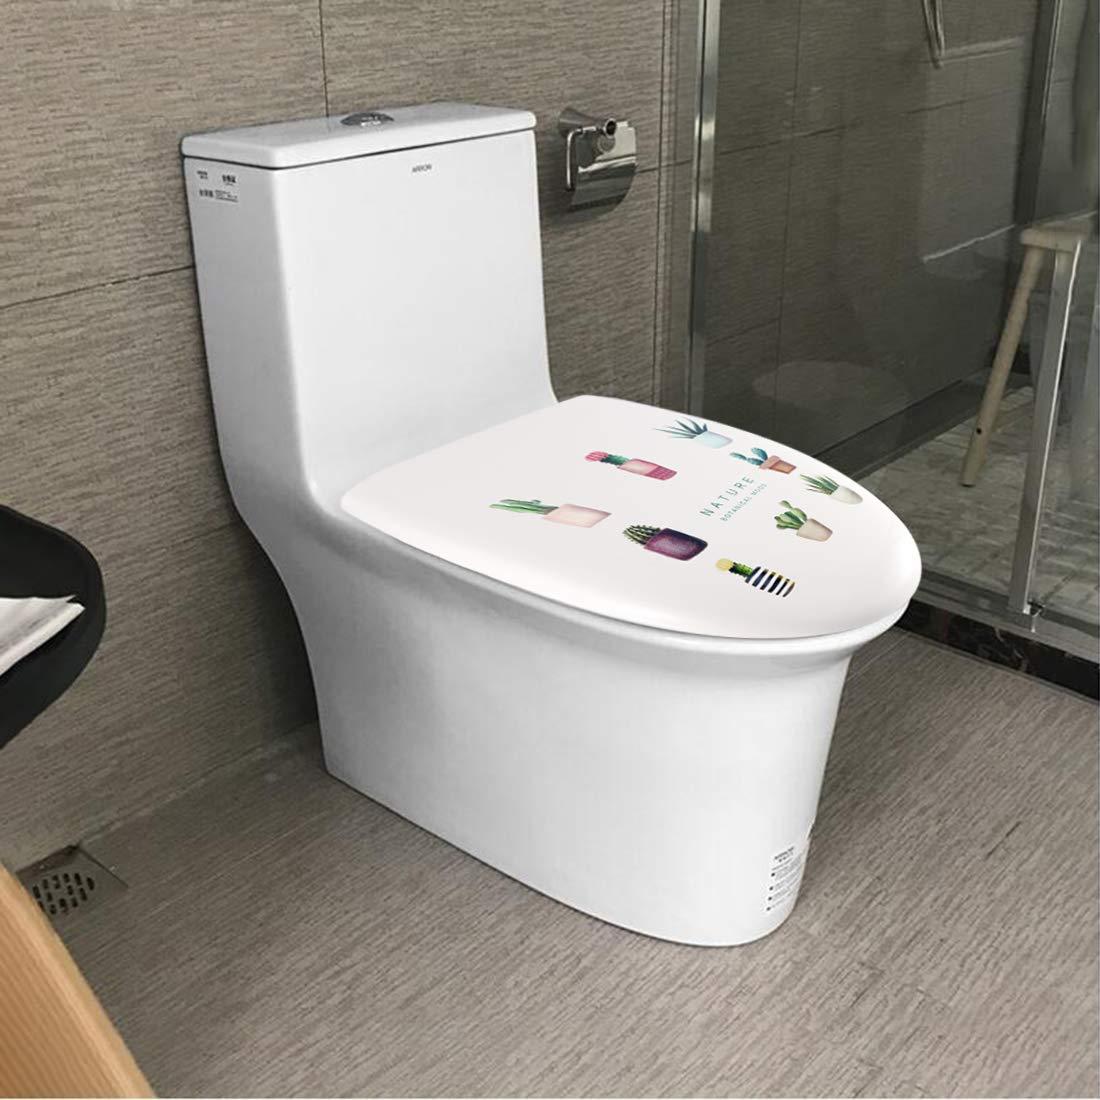 Succulents JOTOM Premium Quality Toilet Seat,Easy to Mount,Beautiful Printed Design Toilet Seats for Bathroom